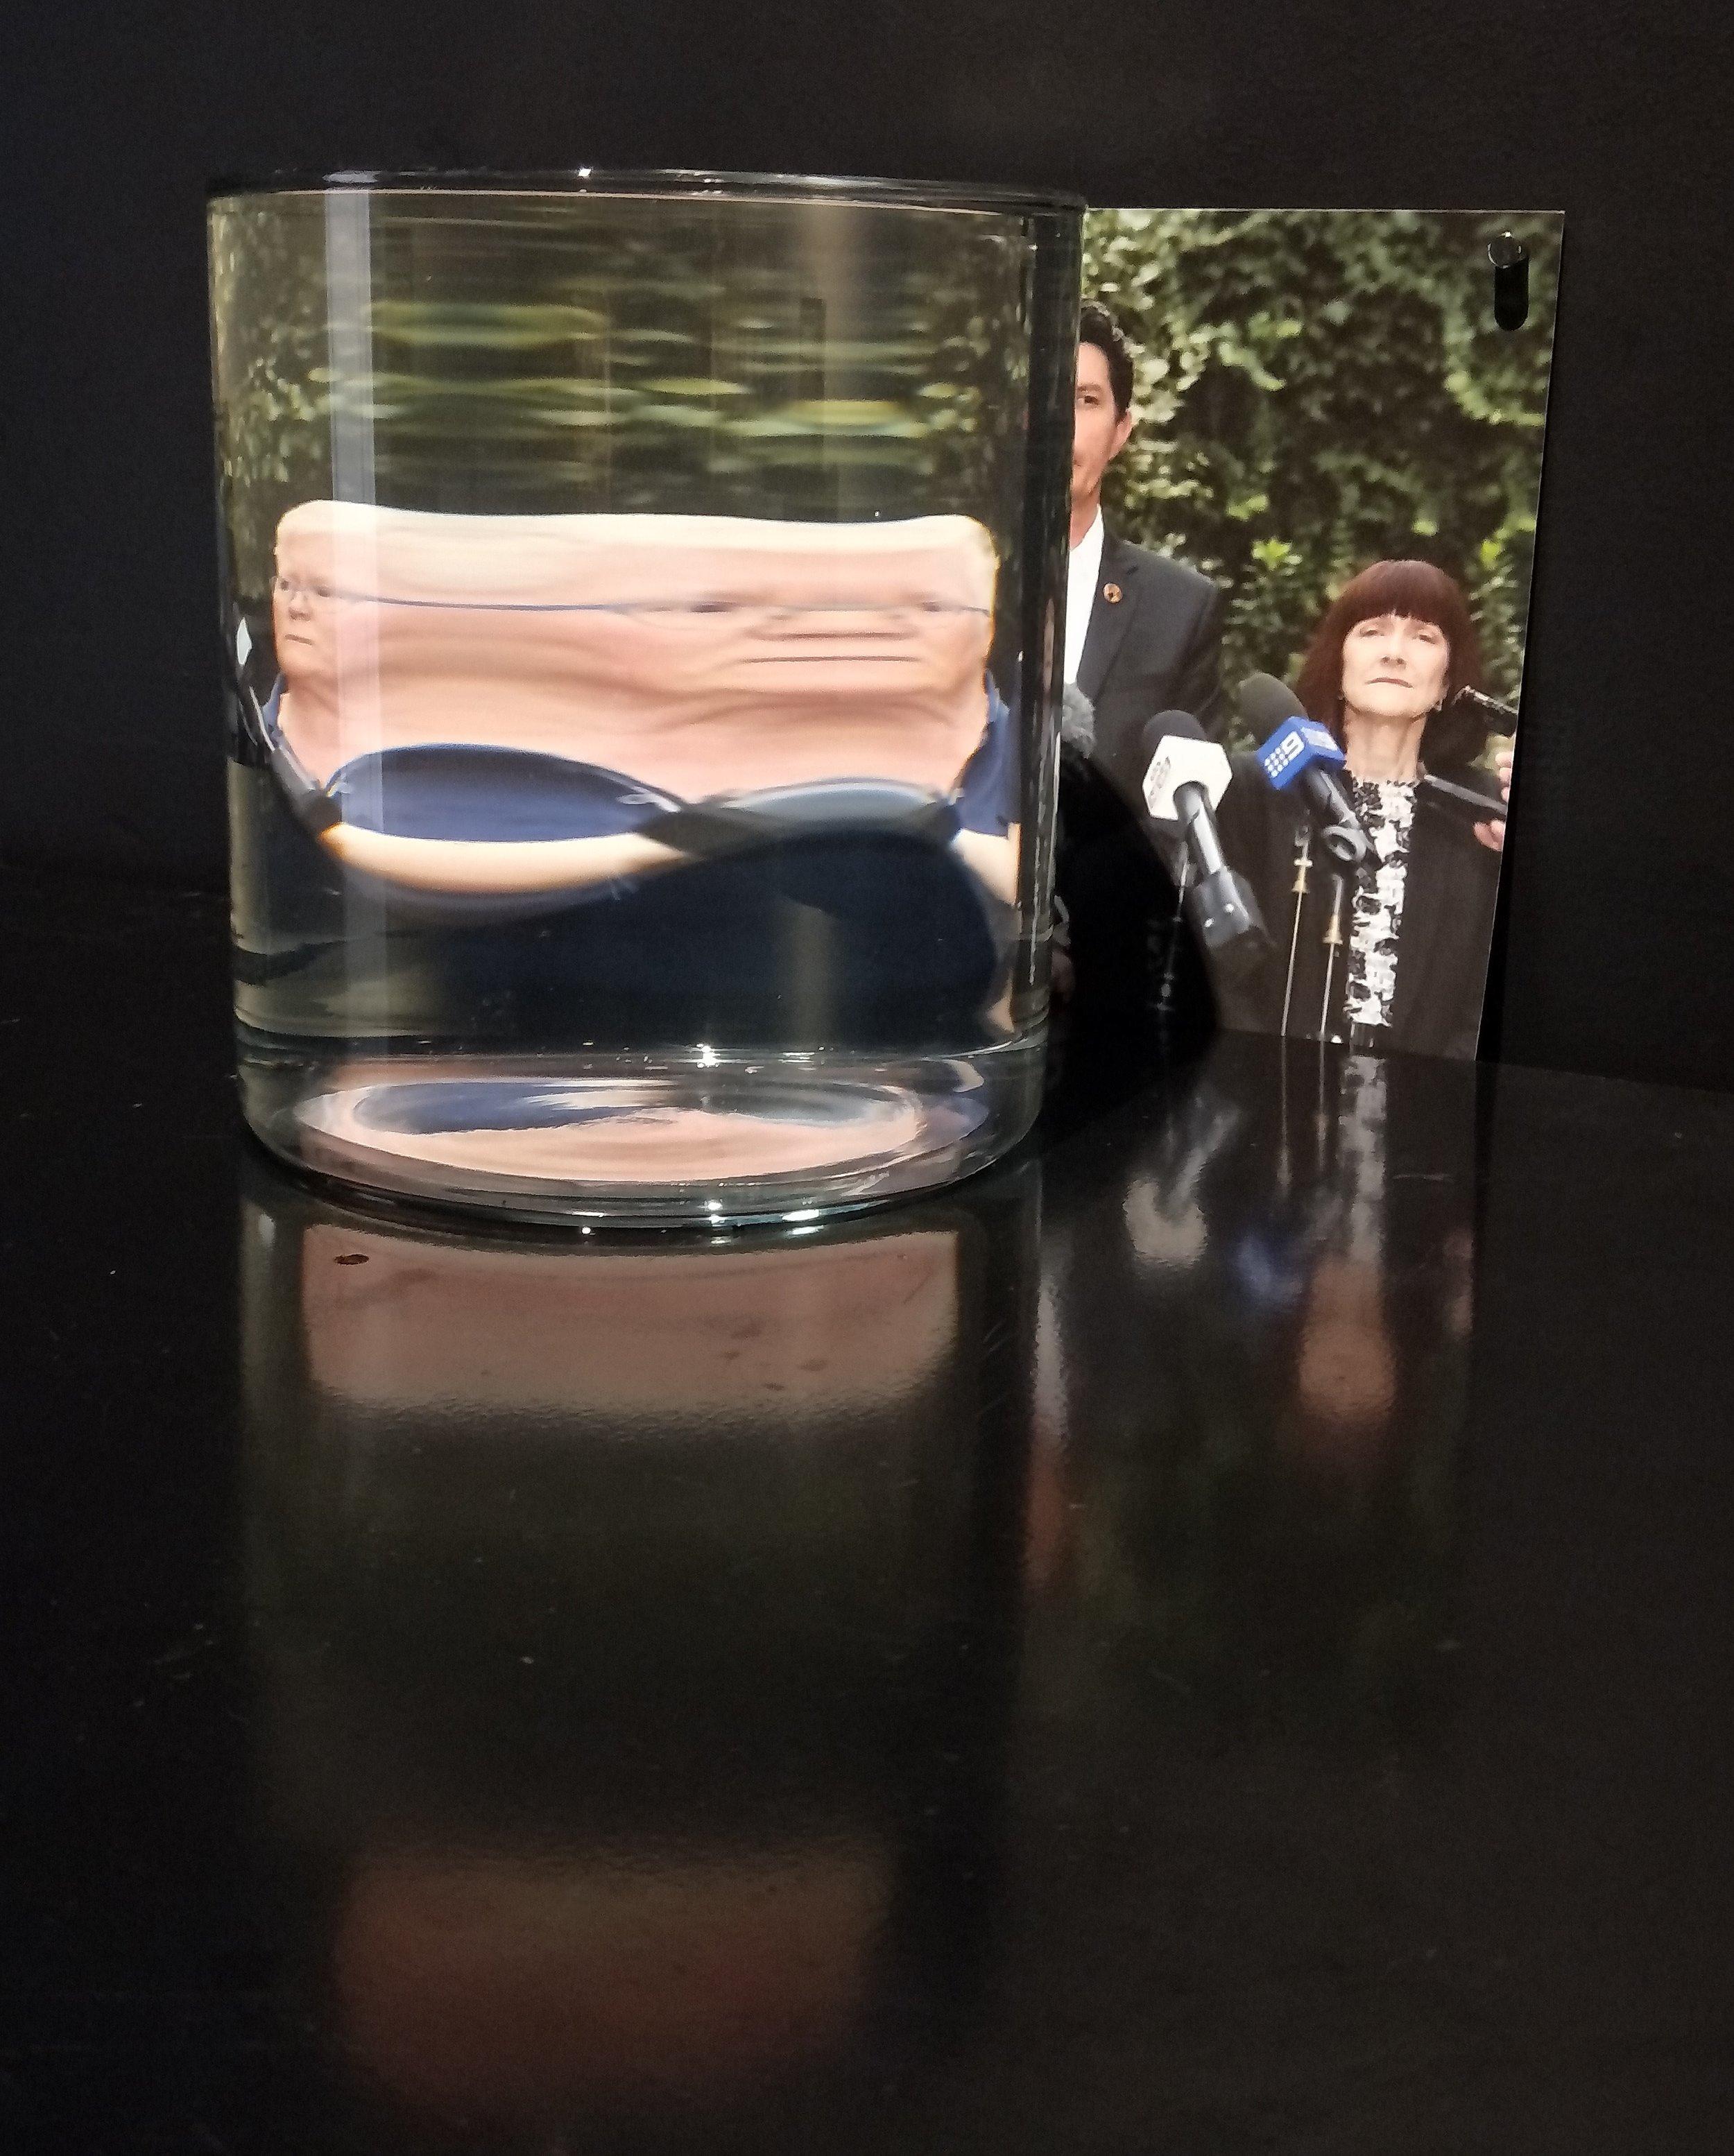 Scott Ludham's Departure: Scott Ludham google image search  2017, paint, steel, inkjet photograph on Museo Rag, google location https://cdn.newsapi.com.au/image/v1/427b9732a143de339d92d4ba284eed88?width=650, water, glass vessel, light, 67cm x 45cm x 140mcm.